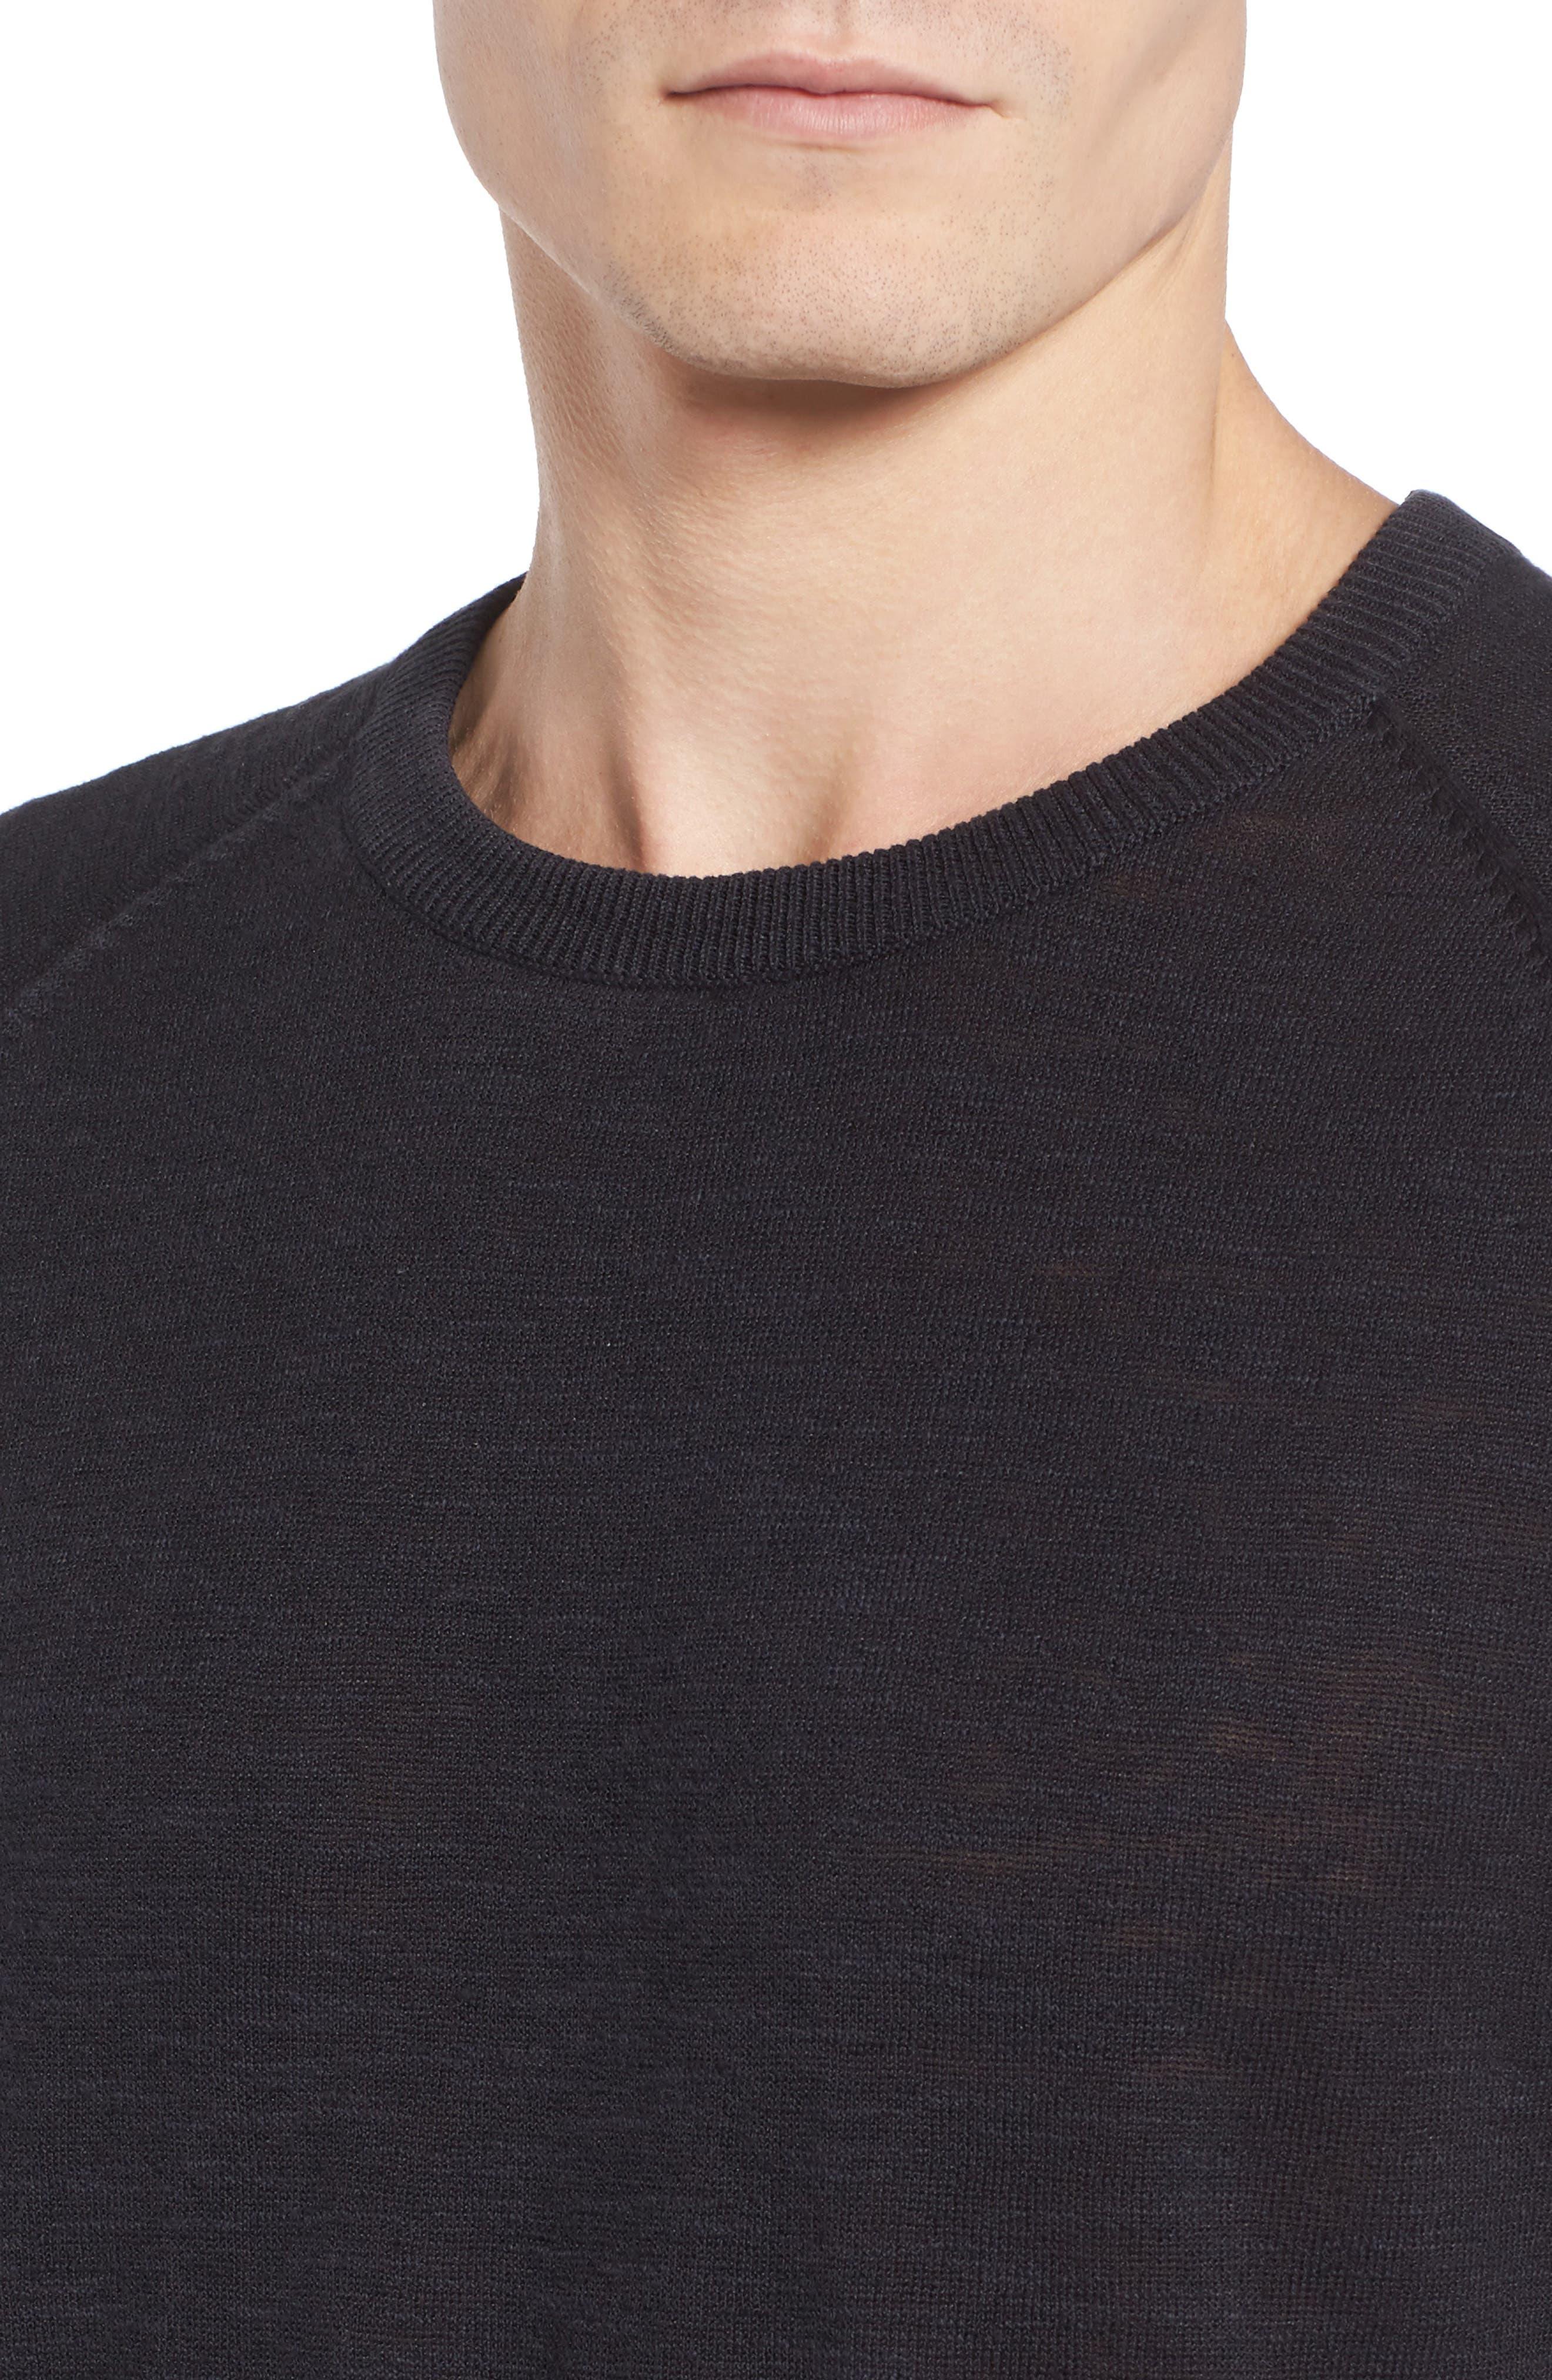 Arambol Cotton & Linen Sweater,                             Alternate thumbnail 4, color,                             409